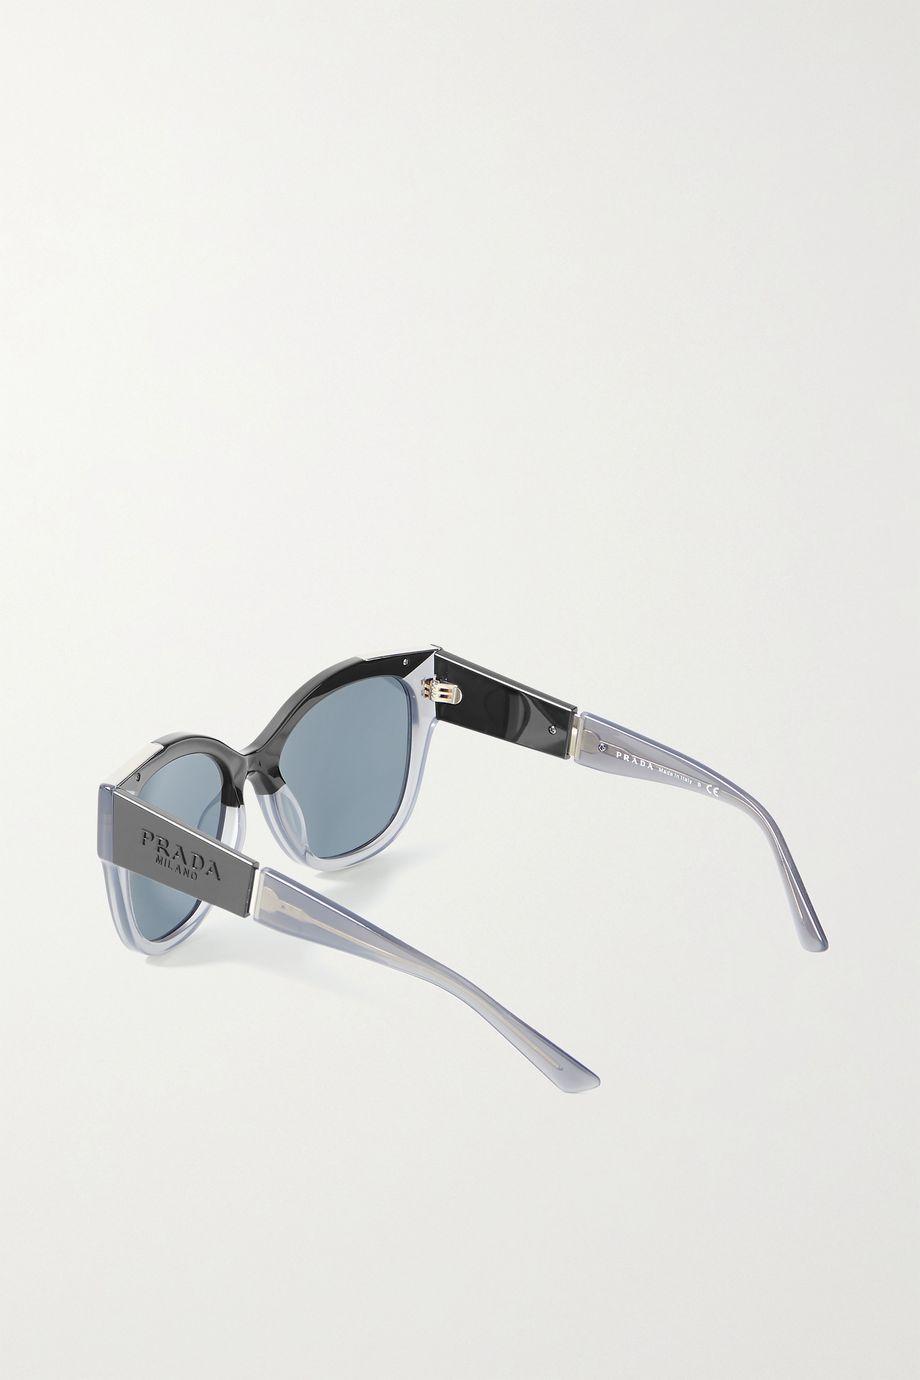 Prada Eyewear Cat-eye acetate and silver-tone sunglasses